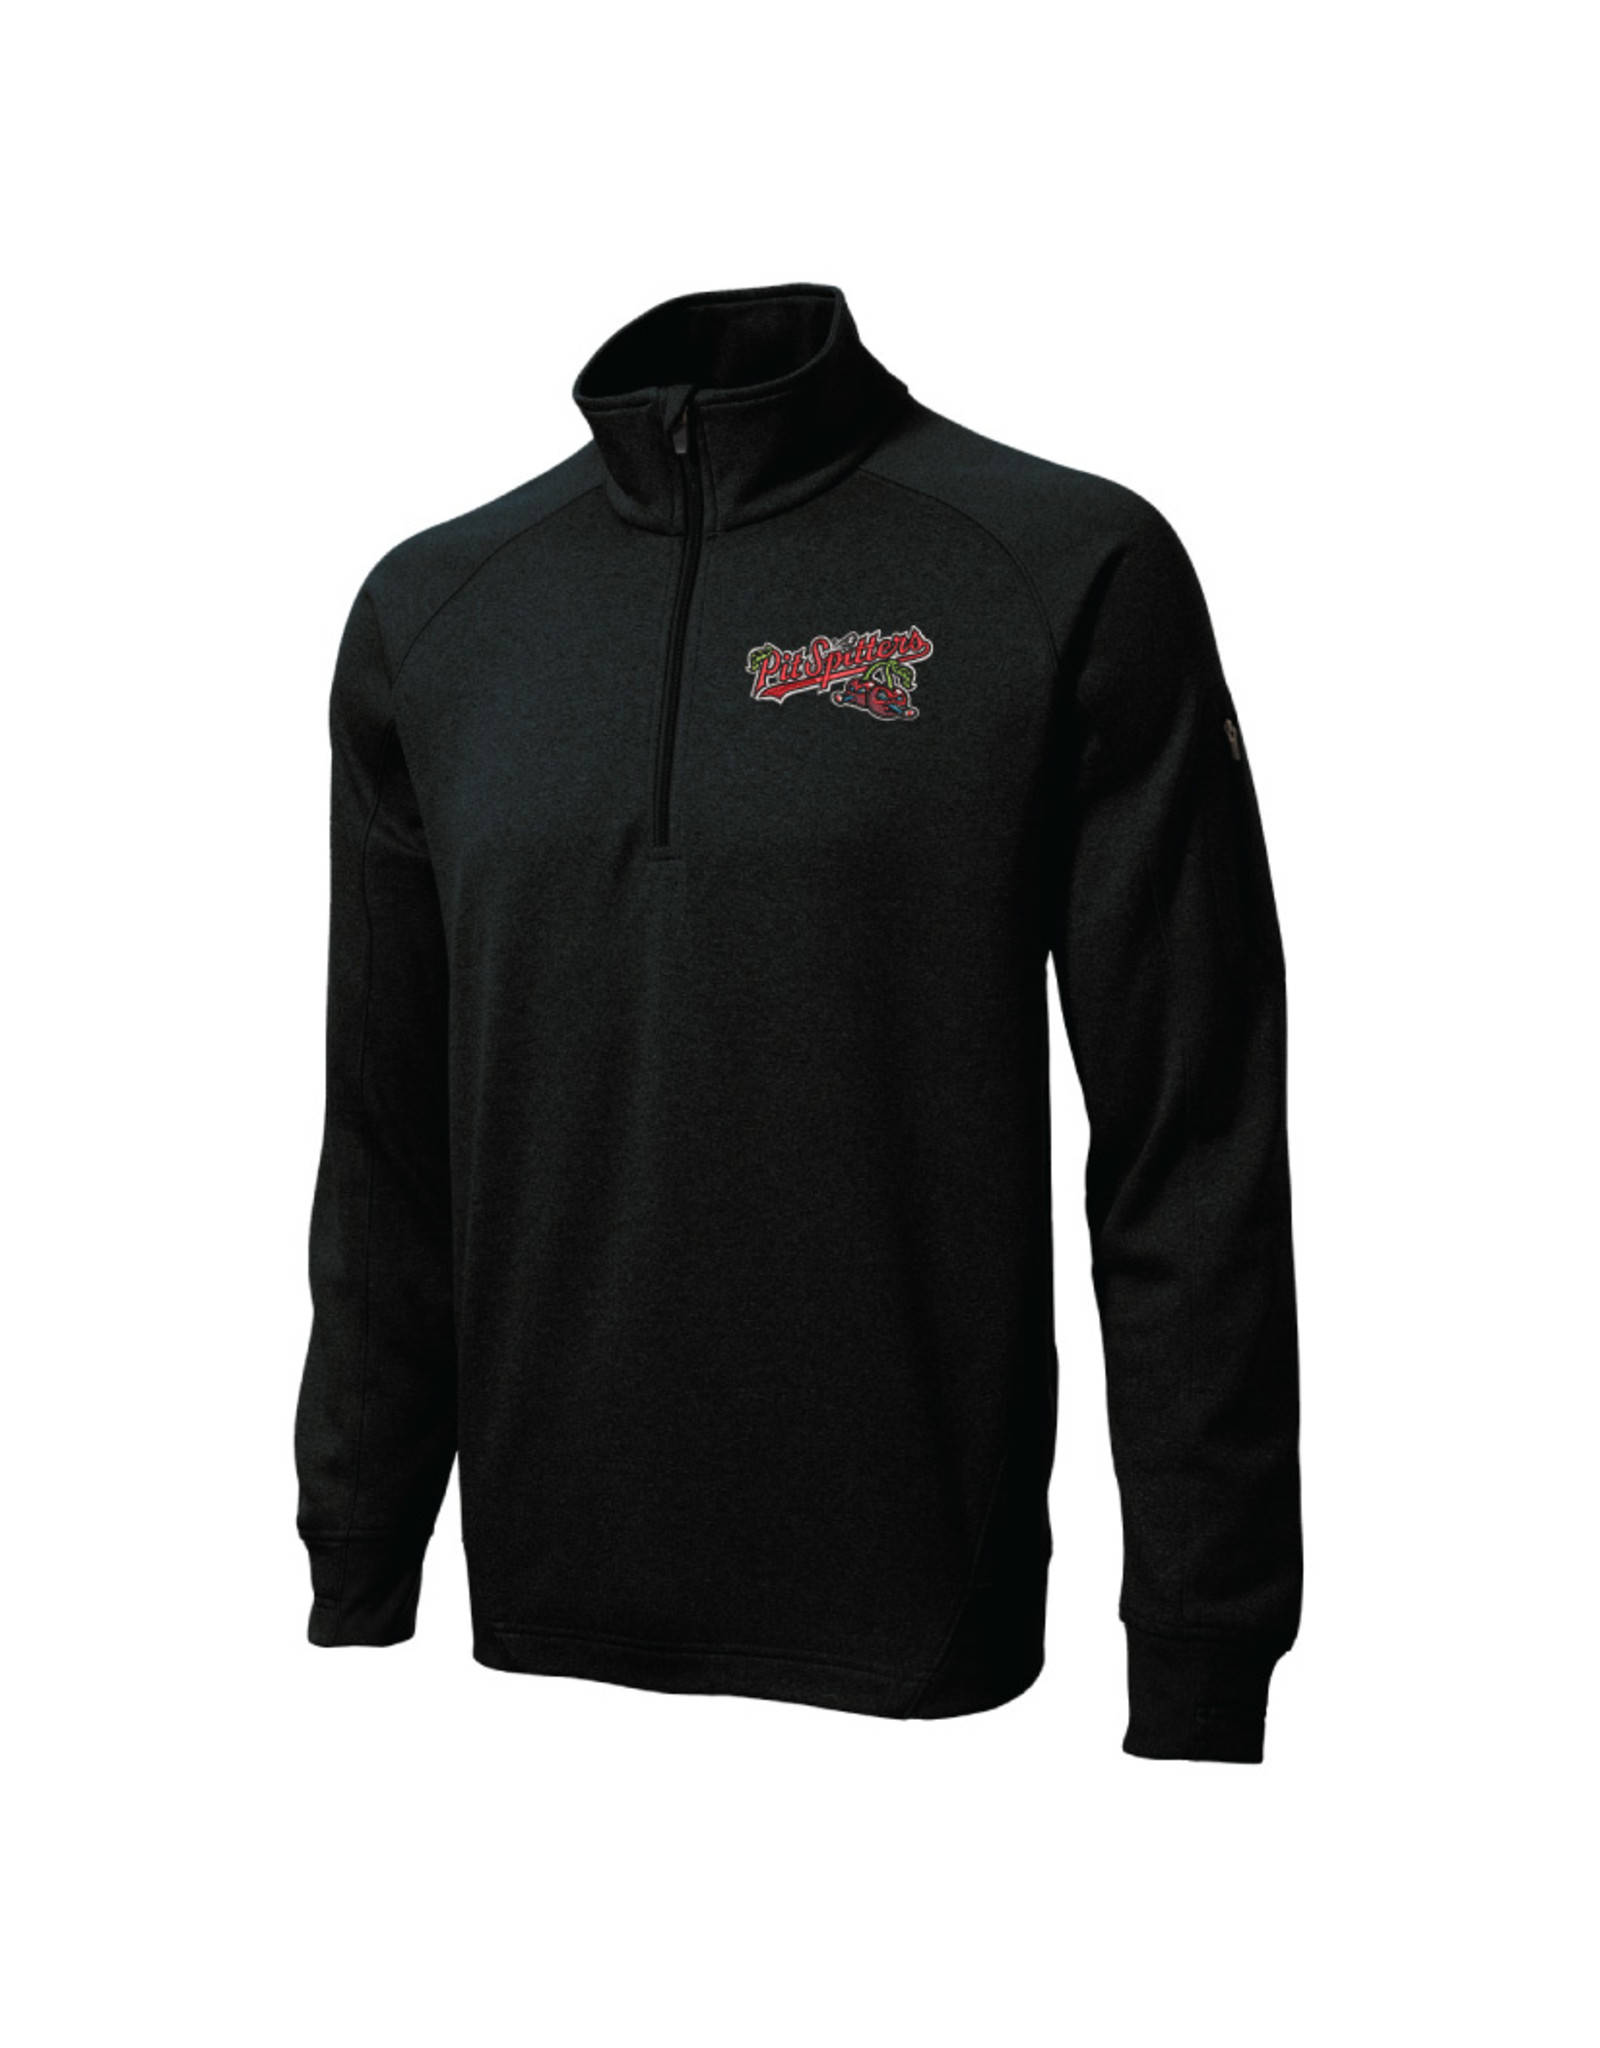 3700 Sport-Tek 1/4 Zip Black Pullover